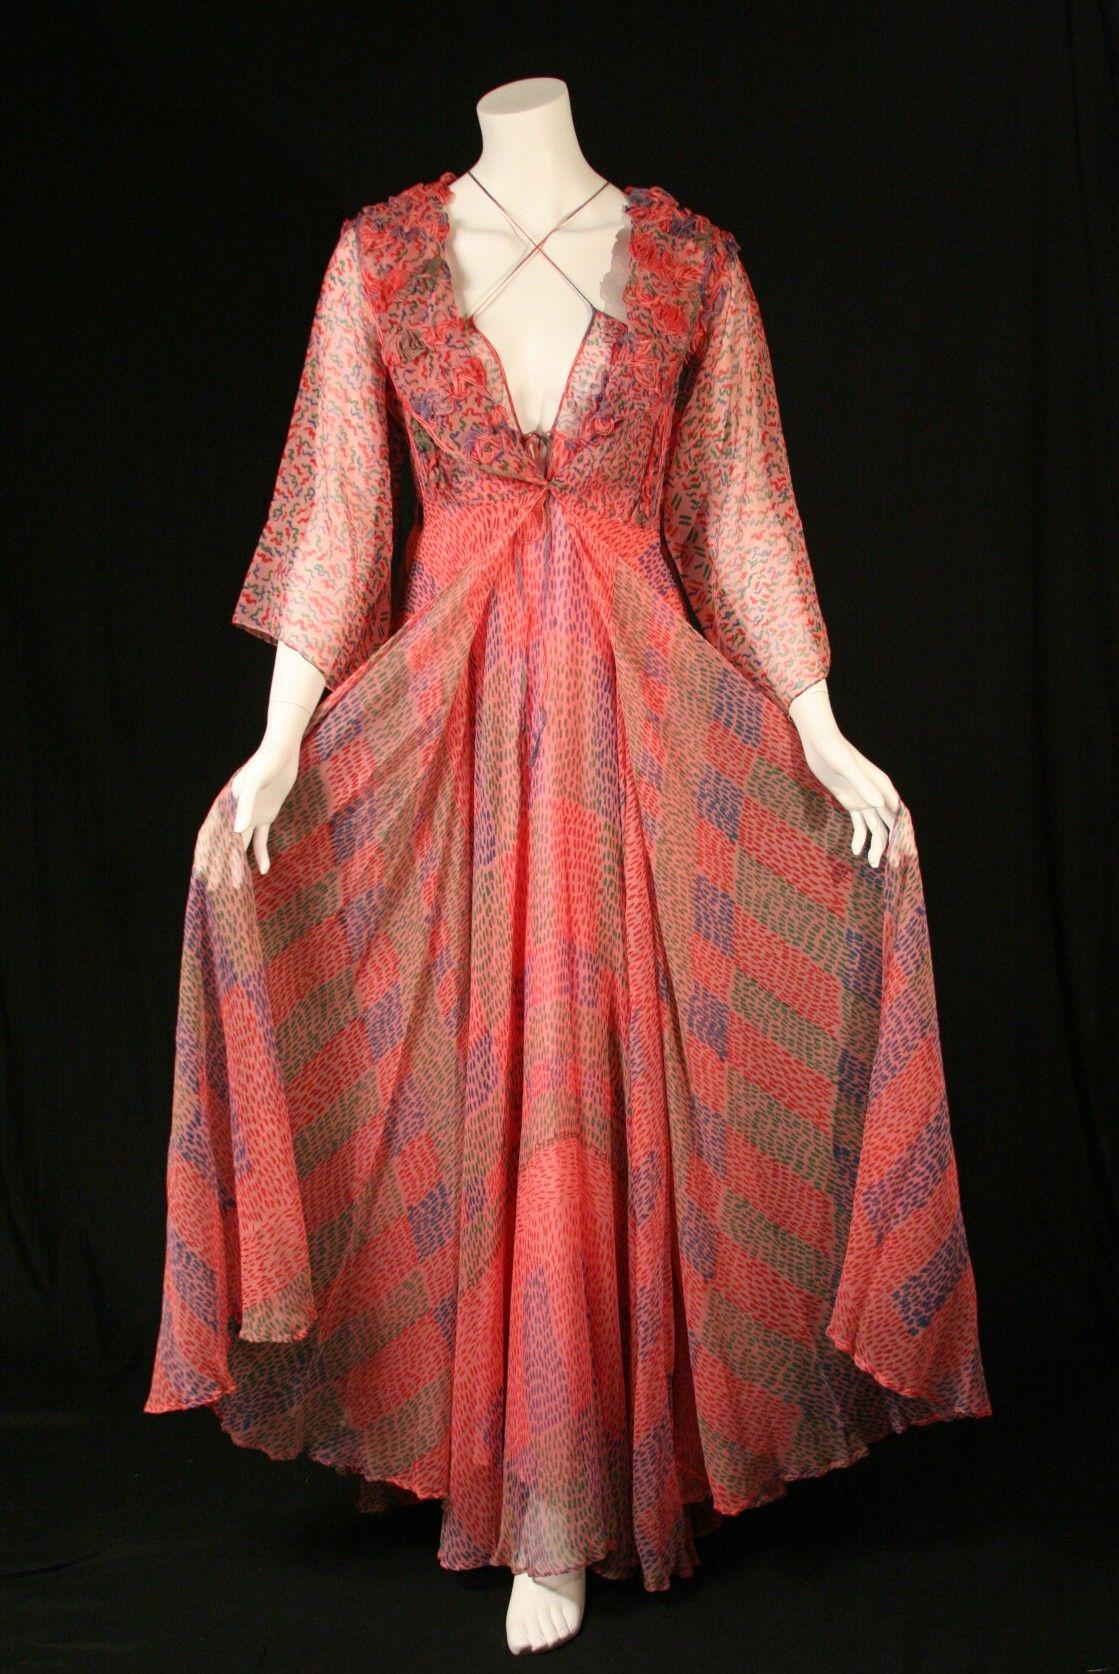 Old Fashion Dress 1890 | vintage Designer clothing at HeavenofGowns ...